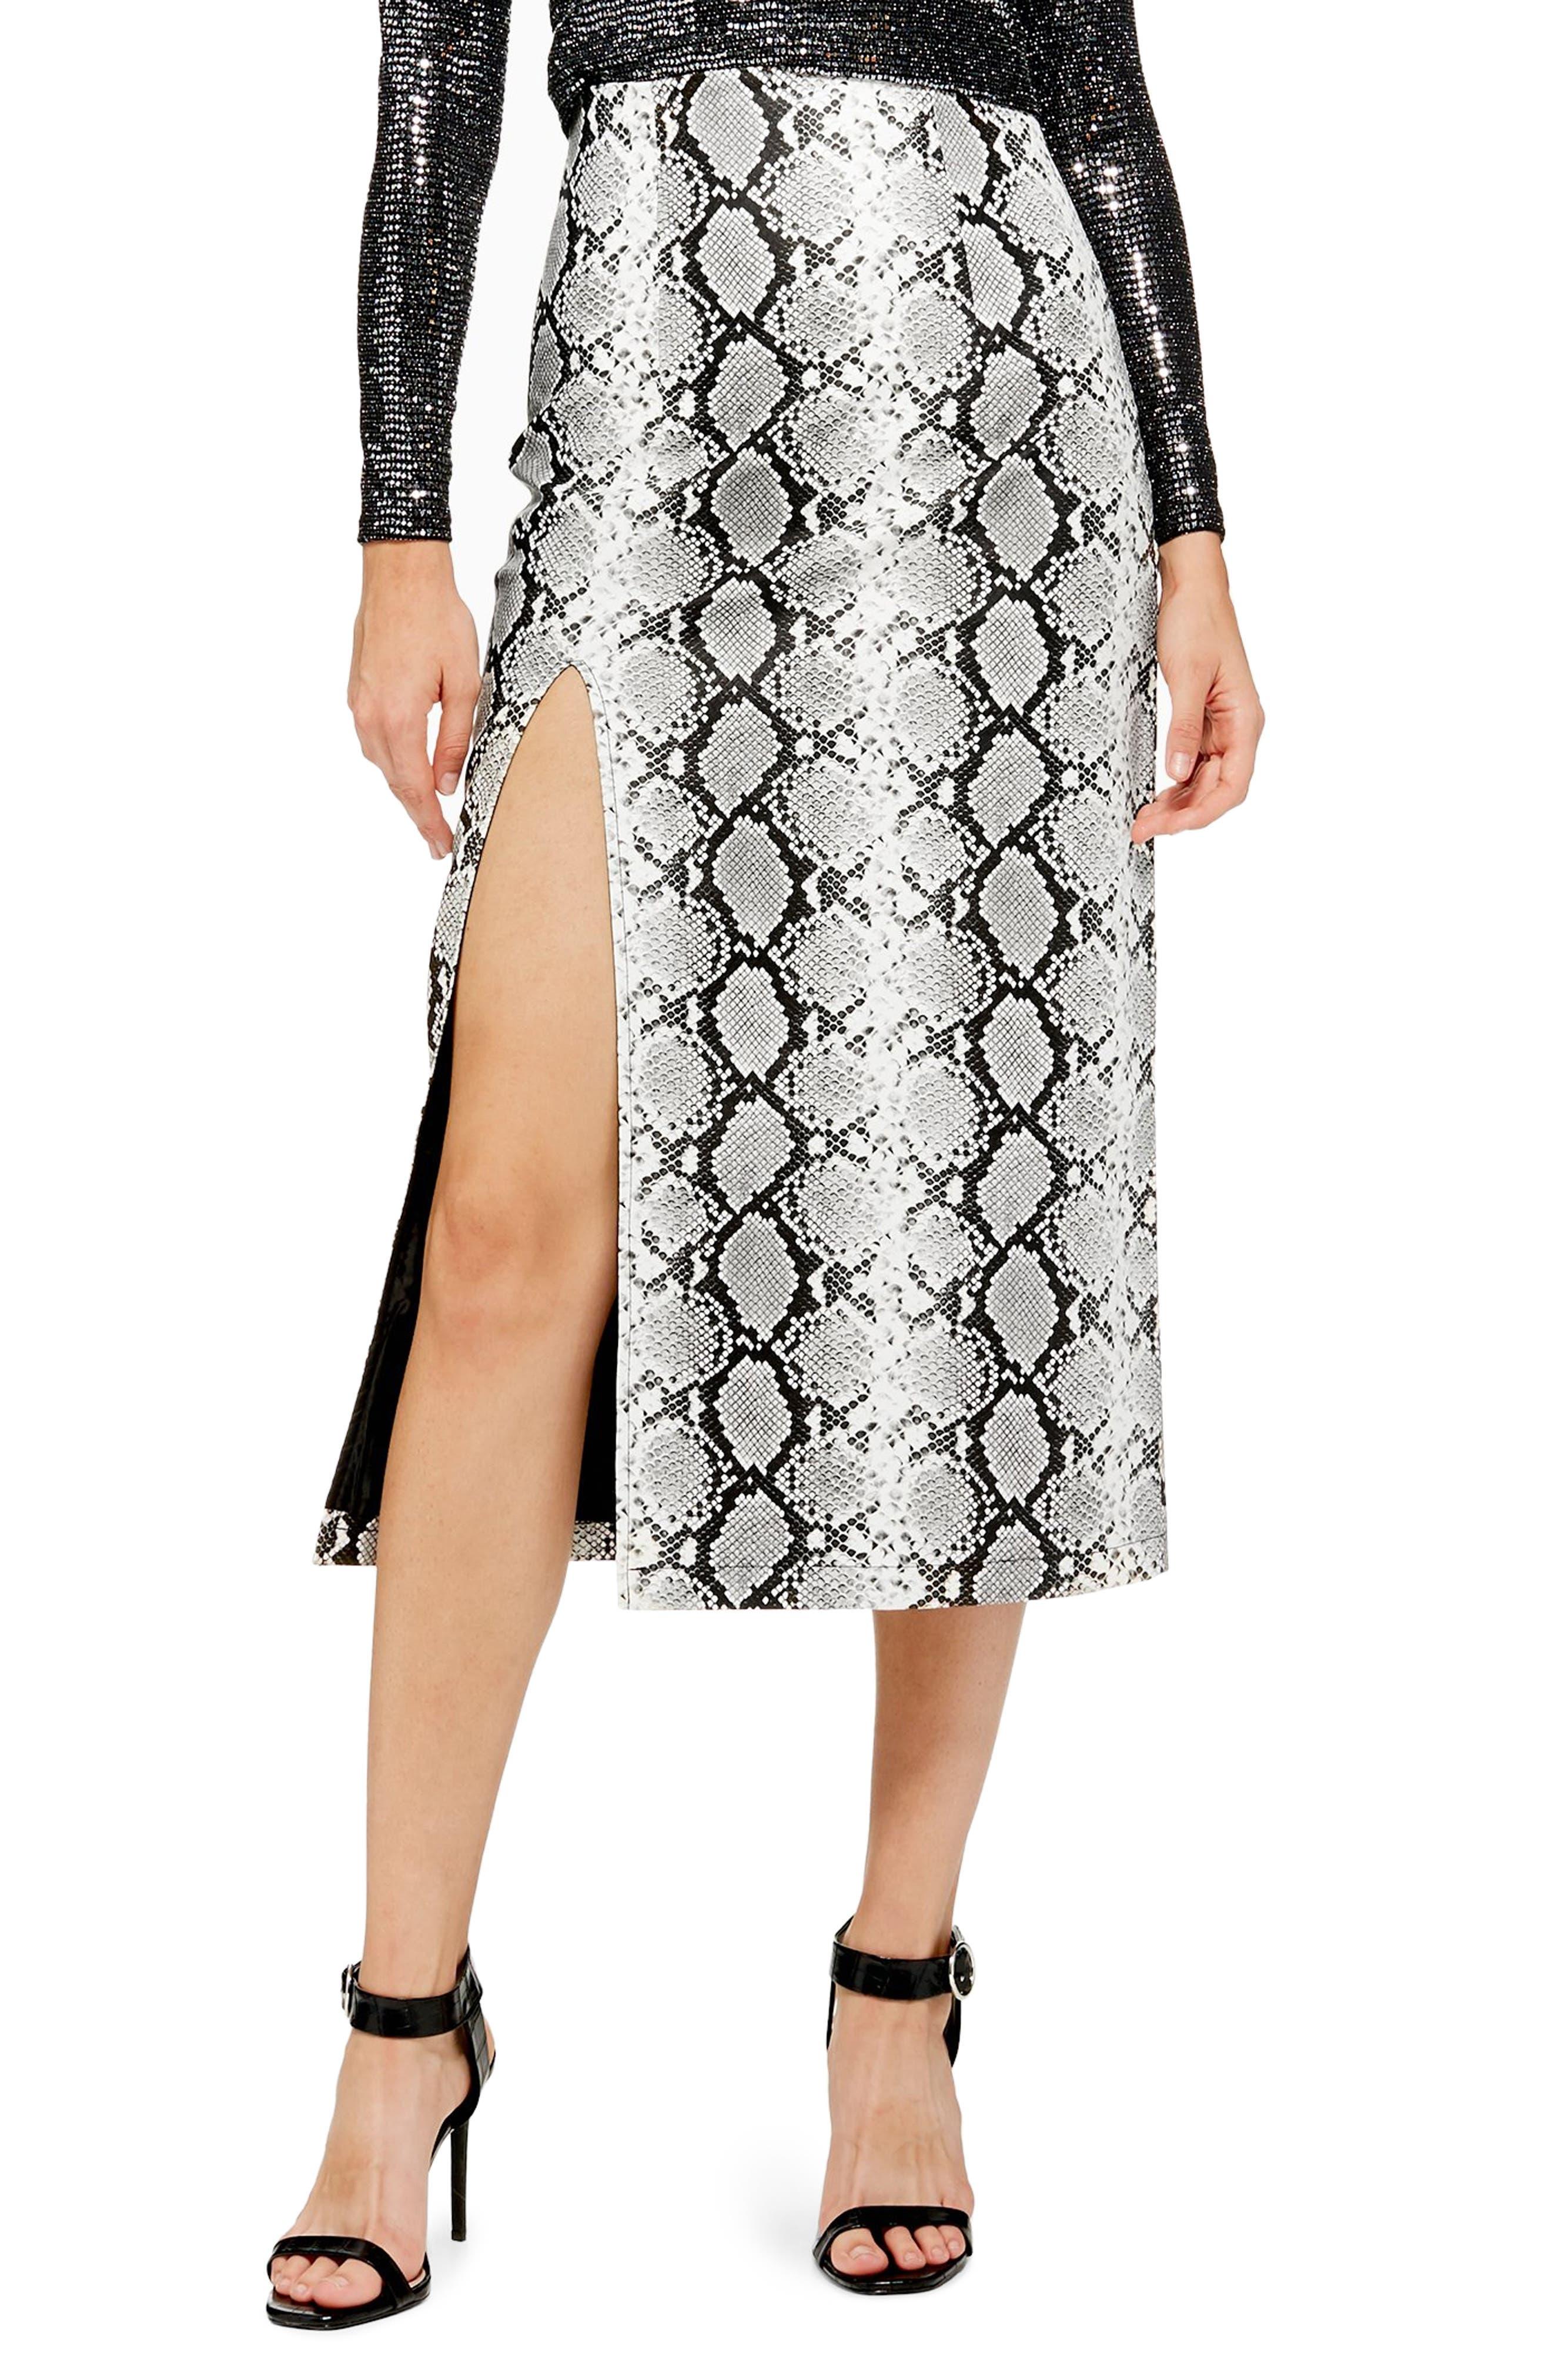 TOPSHOP, Snake Print Faux Leather Midi Skirt, Main thumbnail 1, color, 002